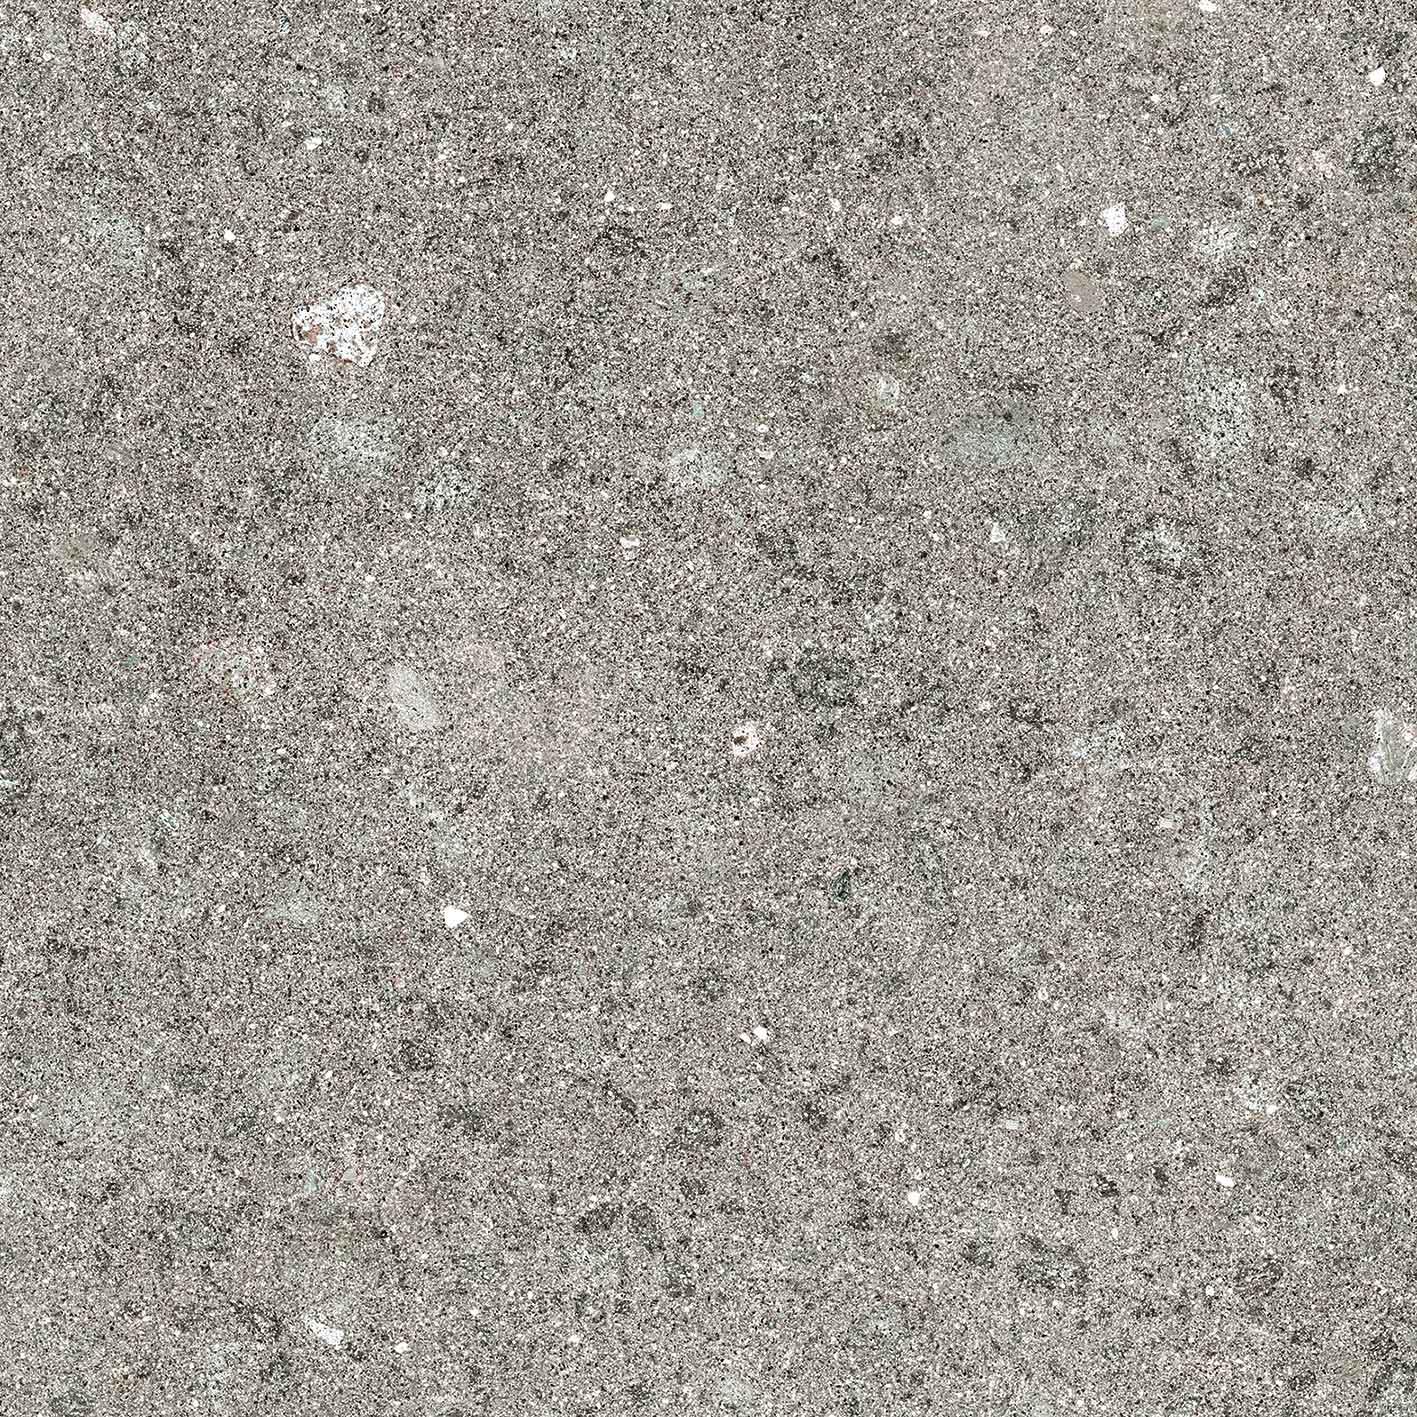 Stontech 4.0 Stone 04 R+PTV 10mm 60 x 60